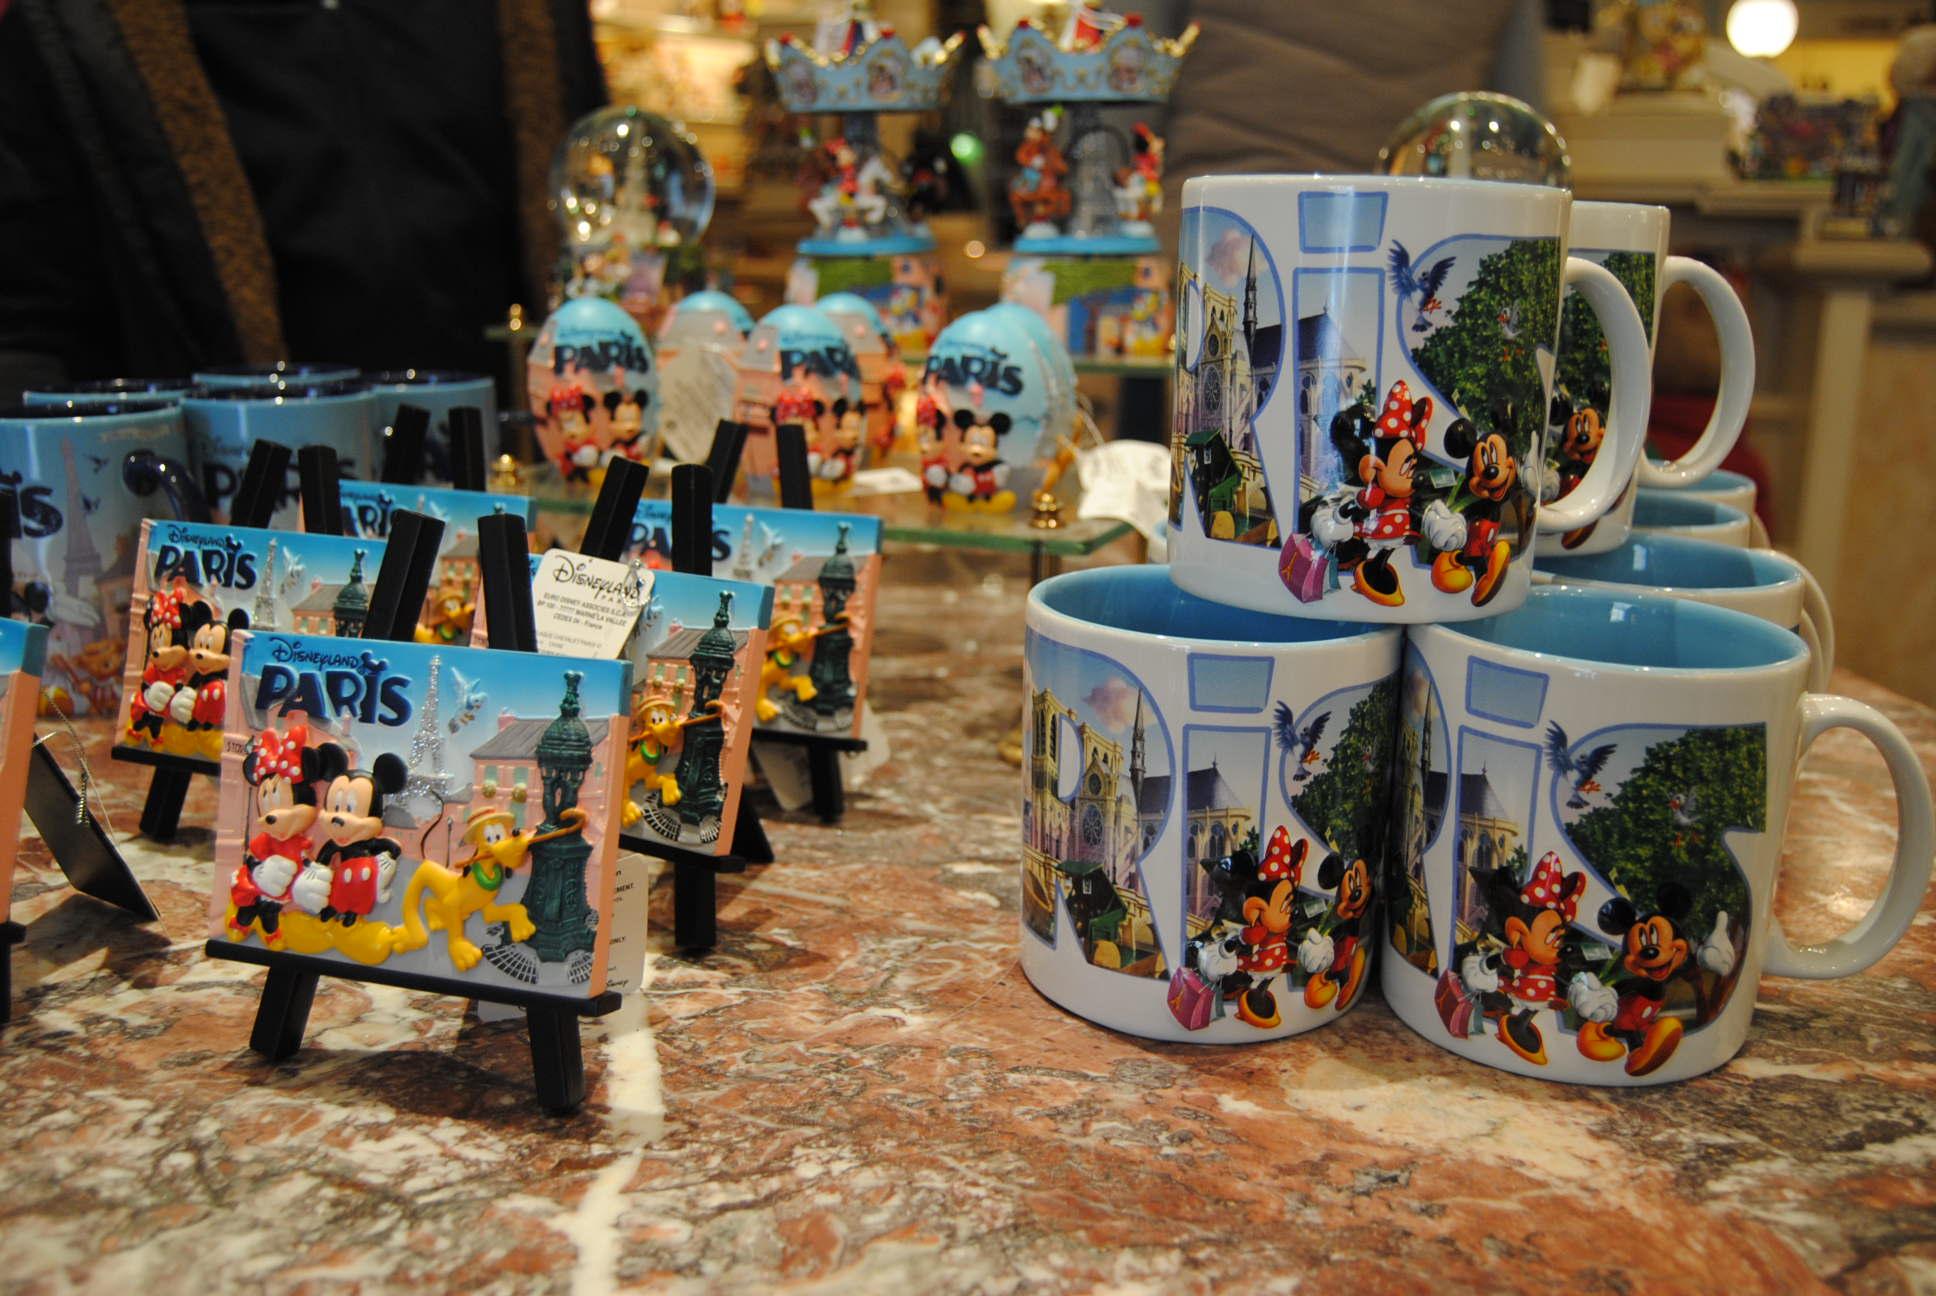 where-to-buy-disney-souvenirs-paris